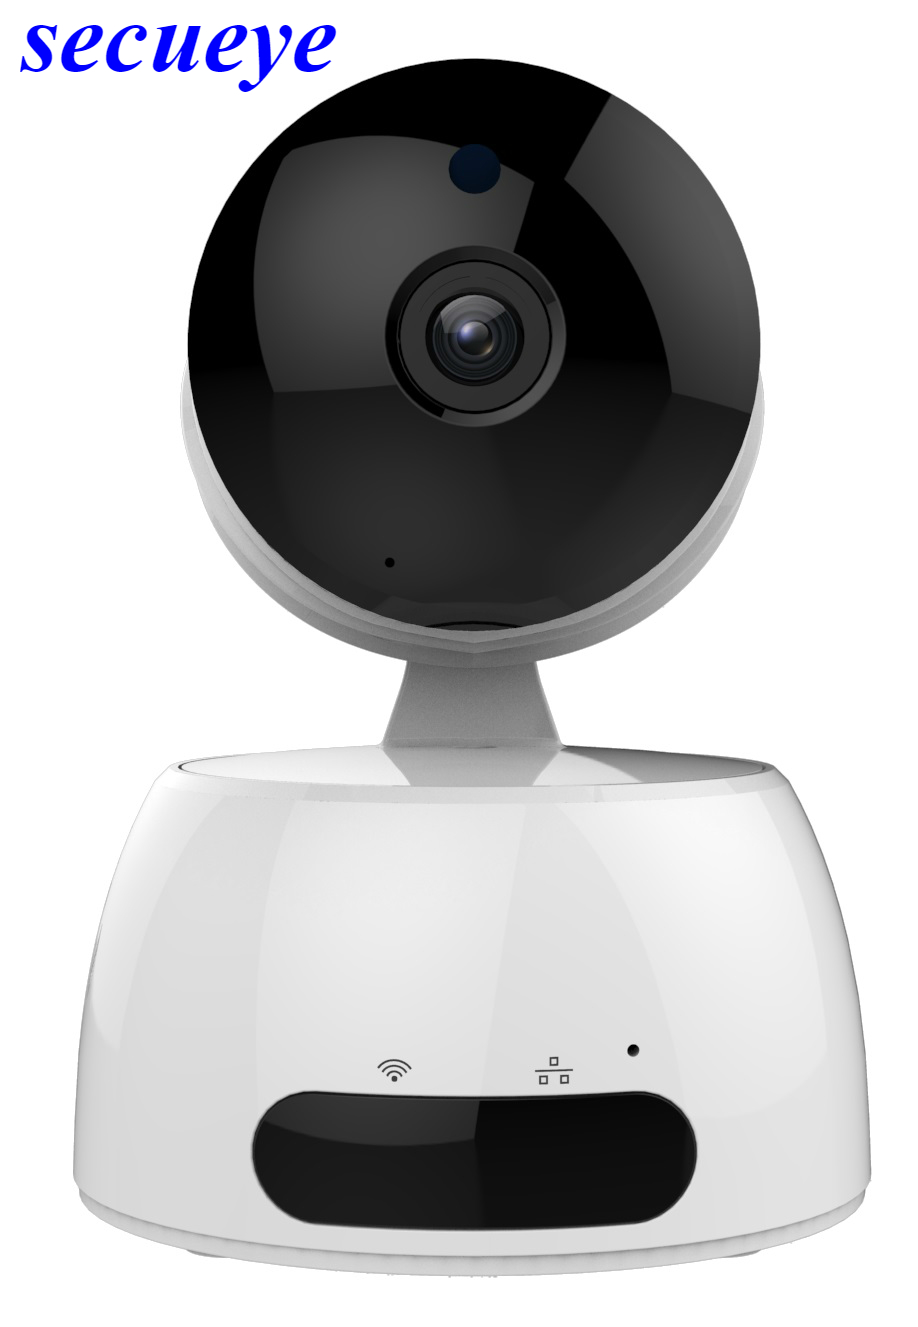 Secueye 1080P Wifi Camera PTZ P2P Wireless HD 2MP IP Camera Baby Monitor IR CUT CMOS Security Surveillance Camera Night Vision hd 1080p wireless wifi ip camera x3 340 degree ptz robot ip camera ir night vision video surveillance cameras baby monitor